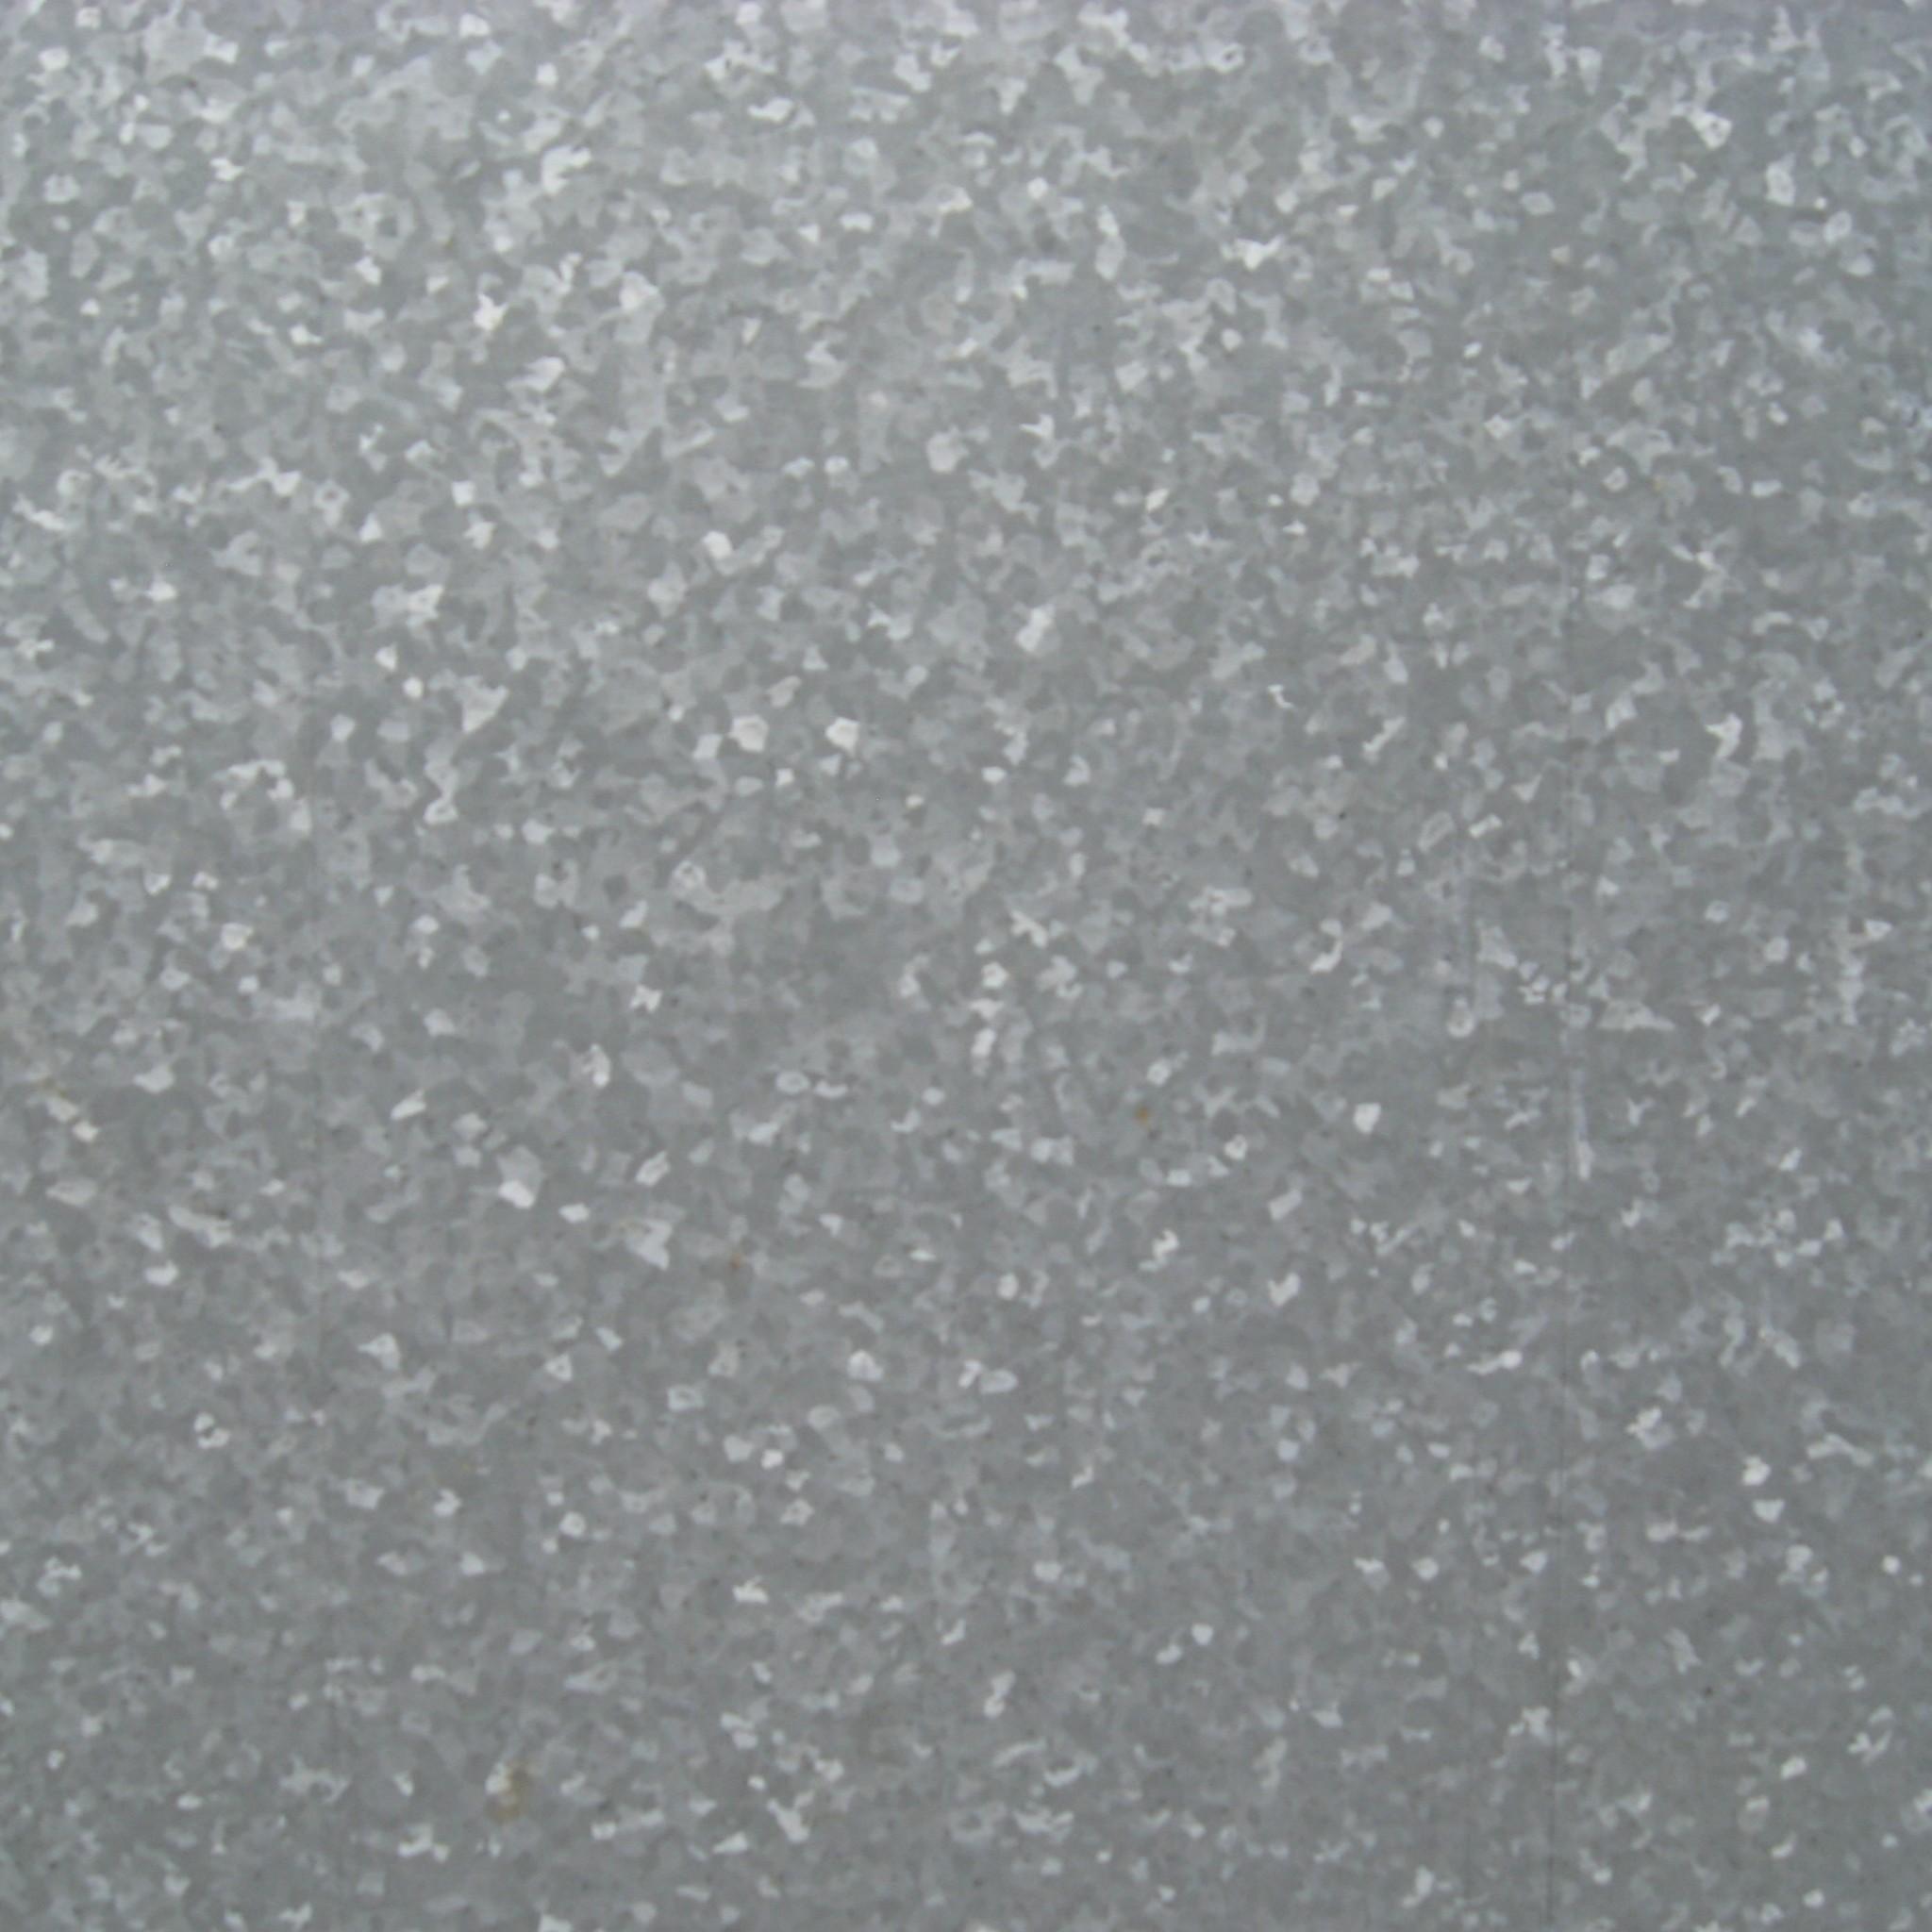 Wallpaper point, surface, metal, texture